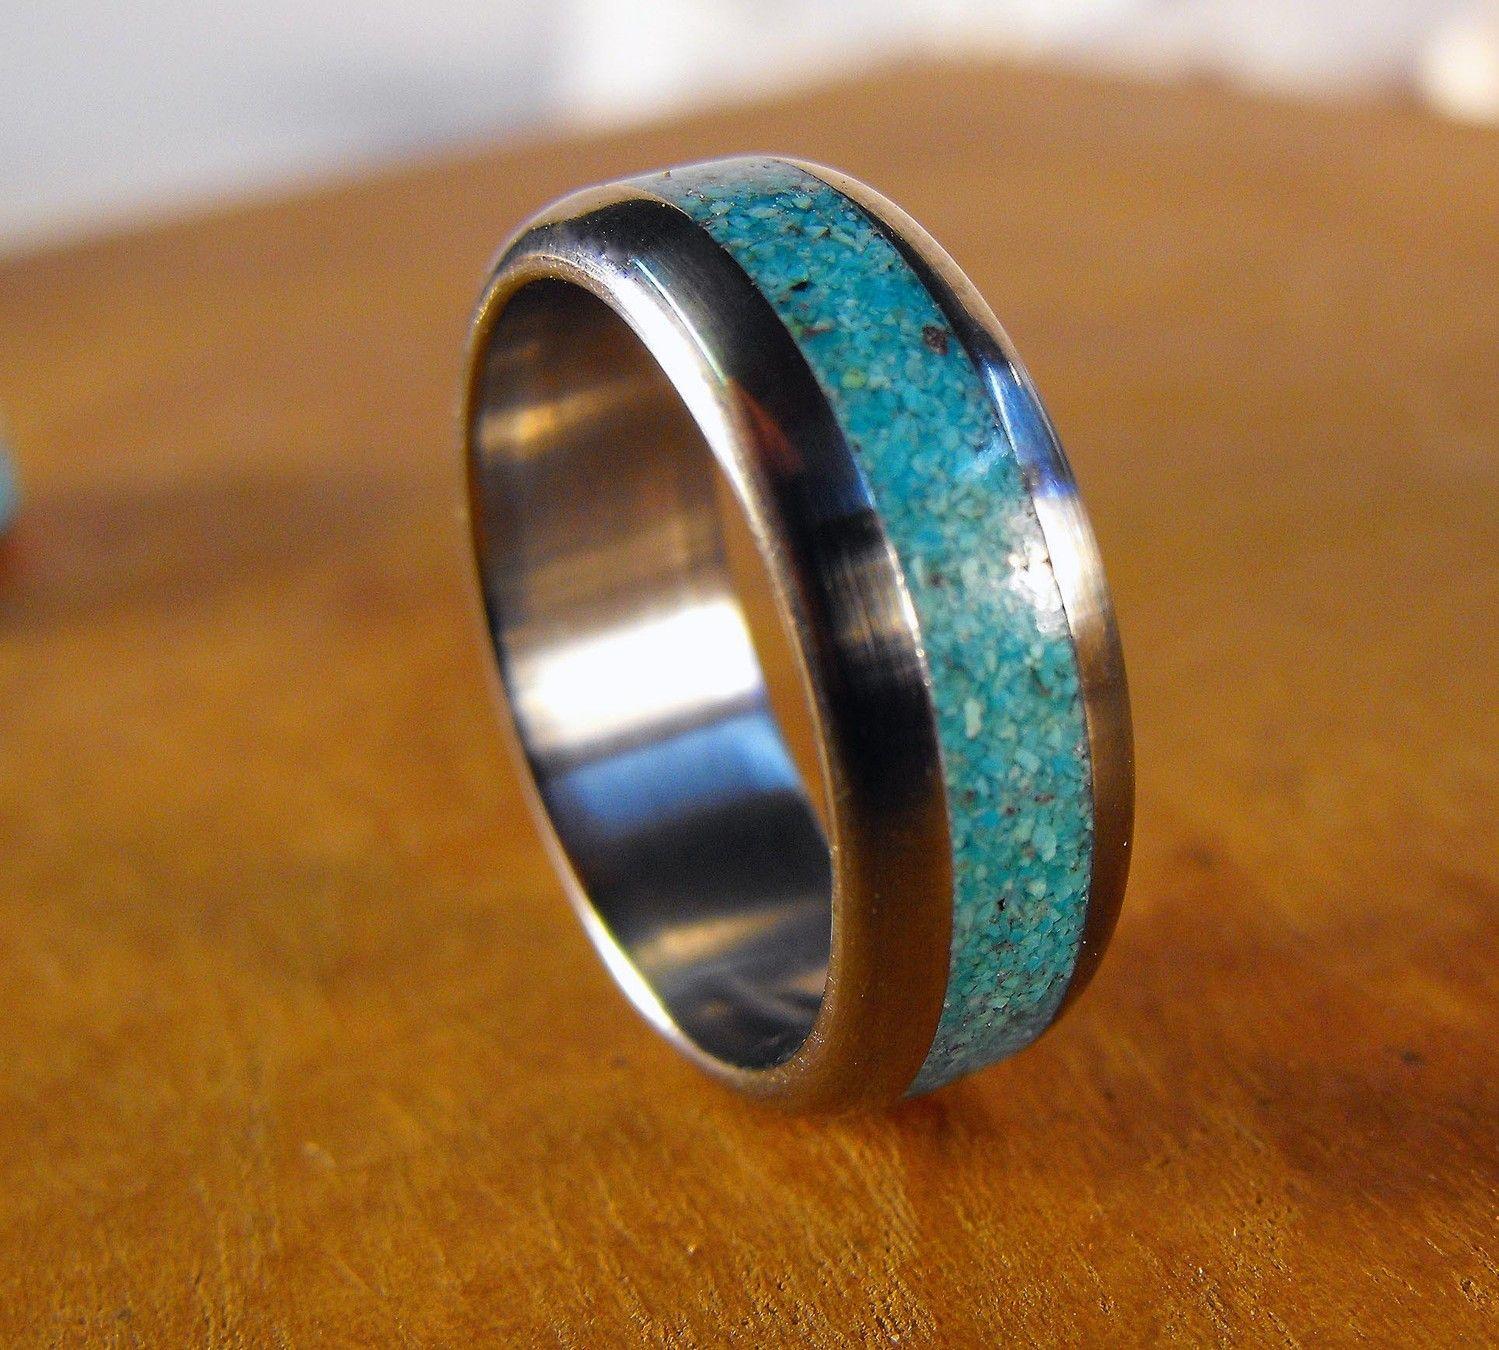 Anium Ring Turquoise Wedding Mens Womens Engagement Promise Engraved